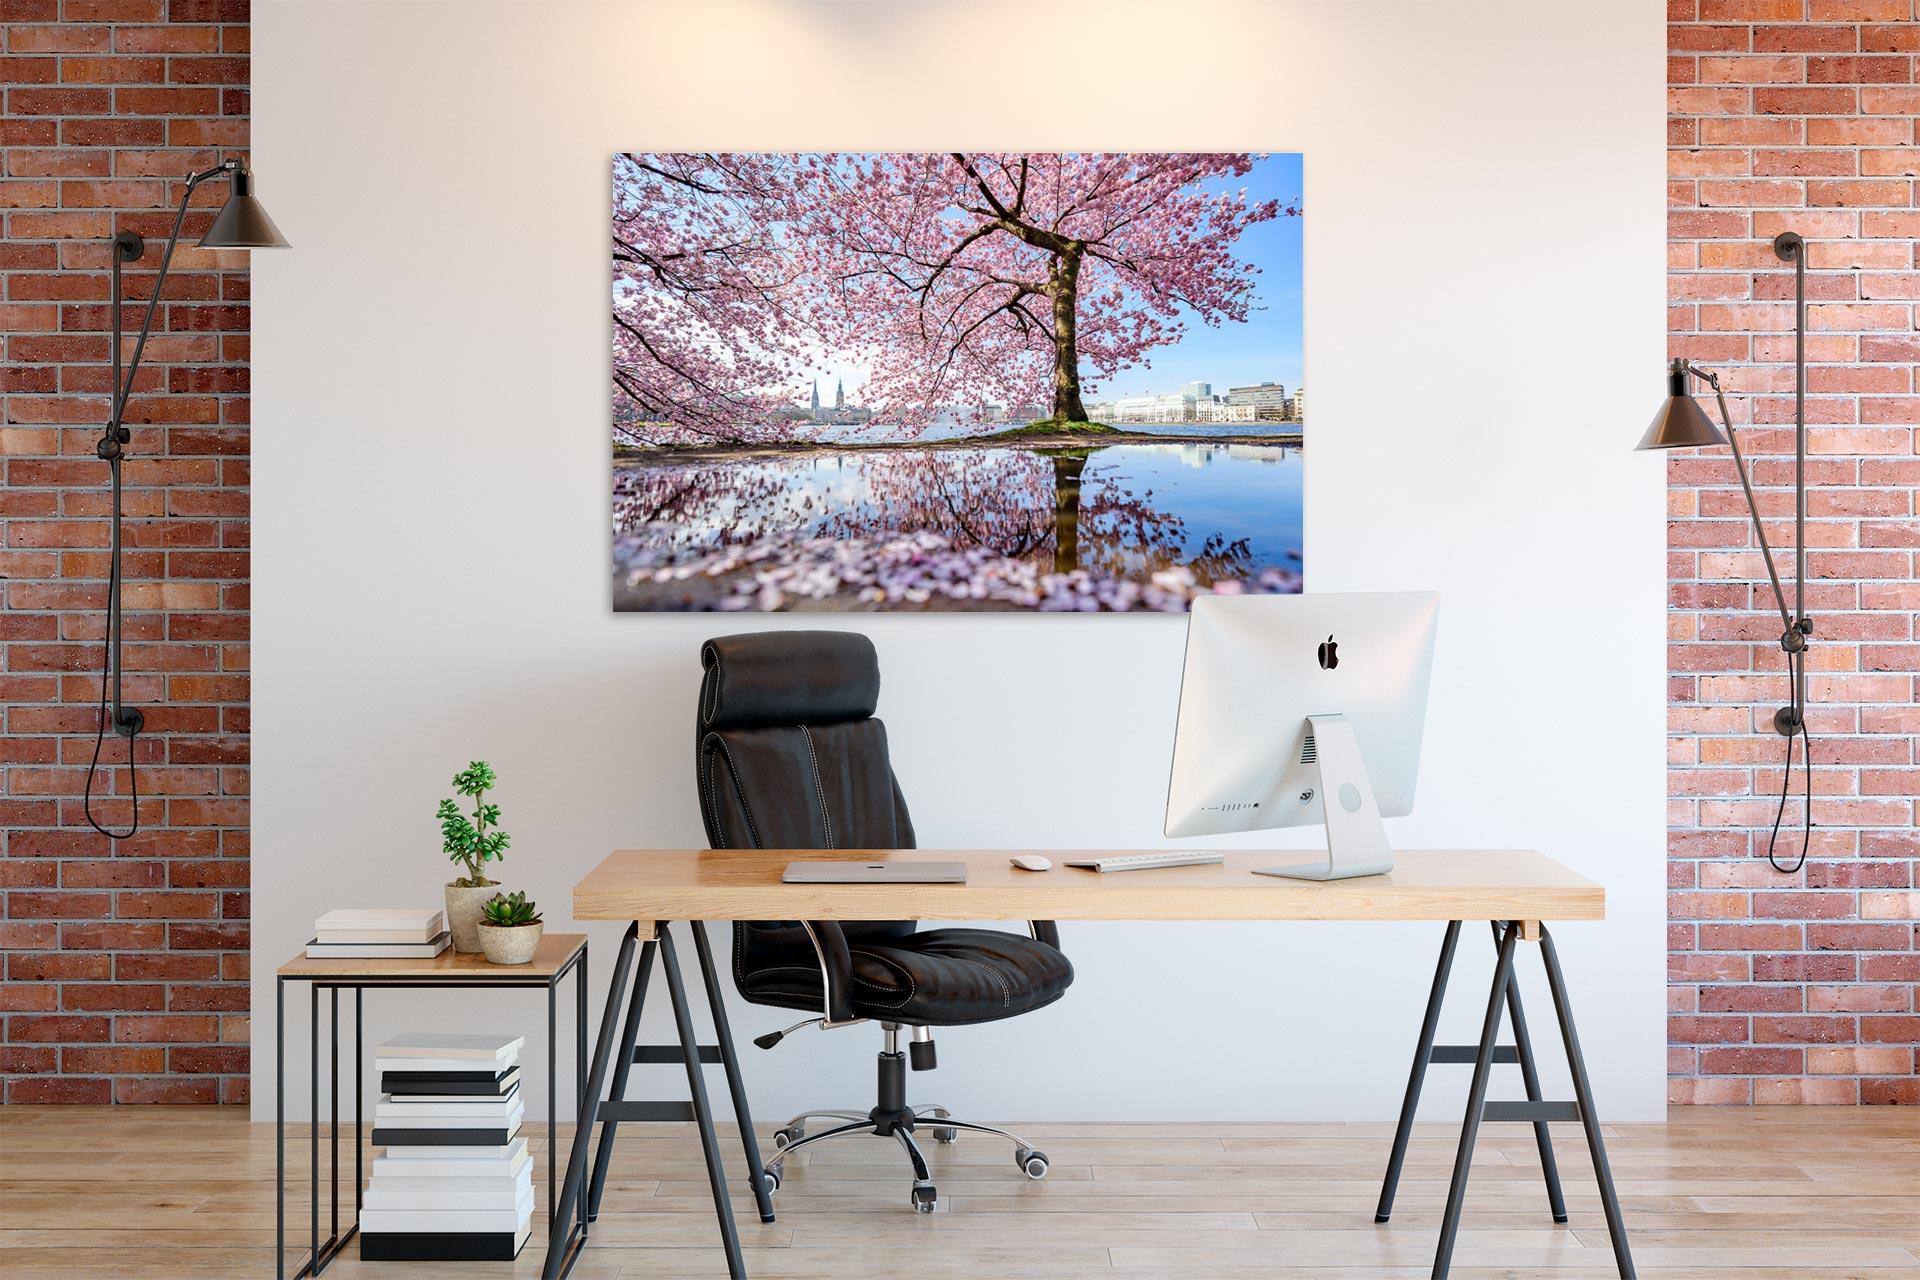 NL069-alster-fruehling-kirschbluete-hamburg-wandbild-auf-leinwand-acrylglas-aludibond-buero